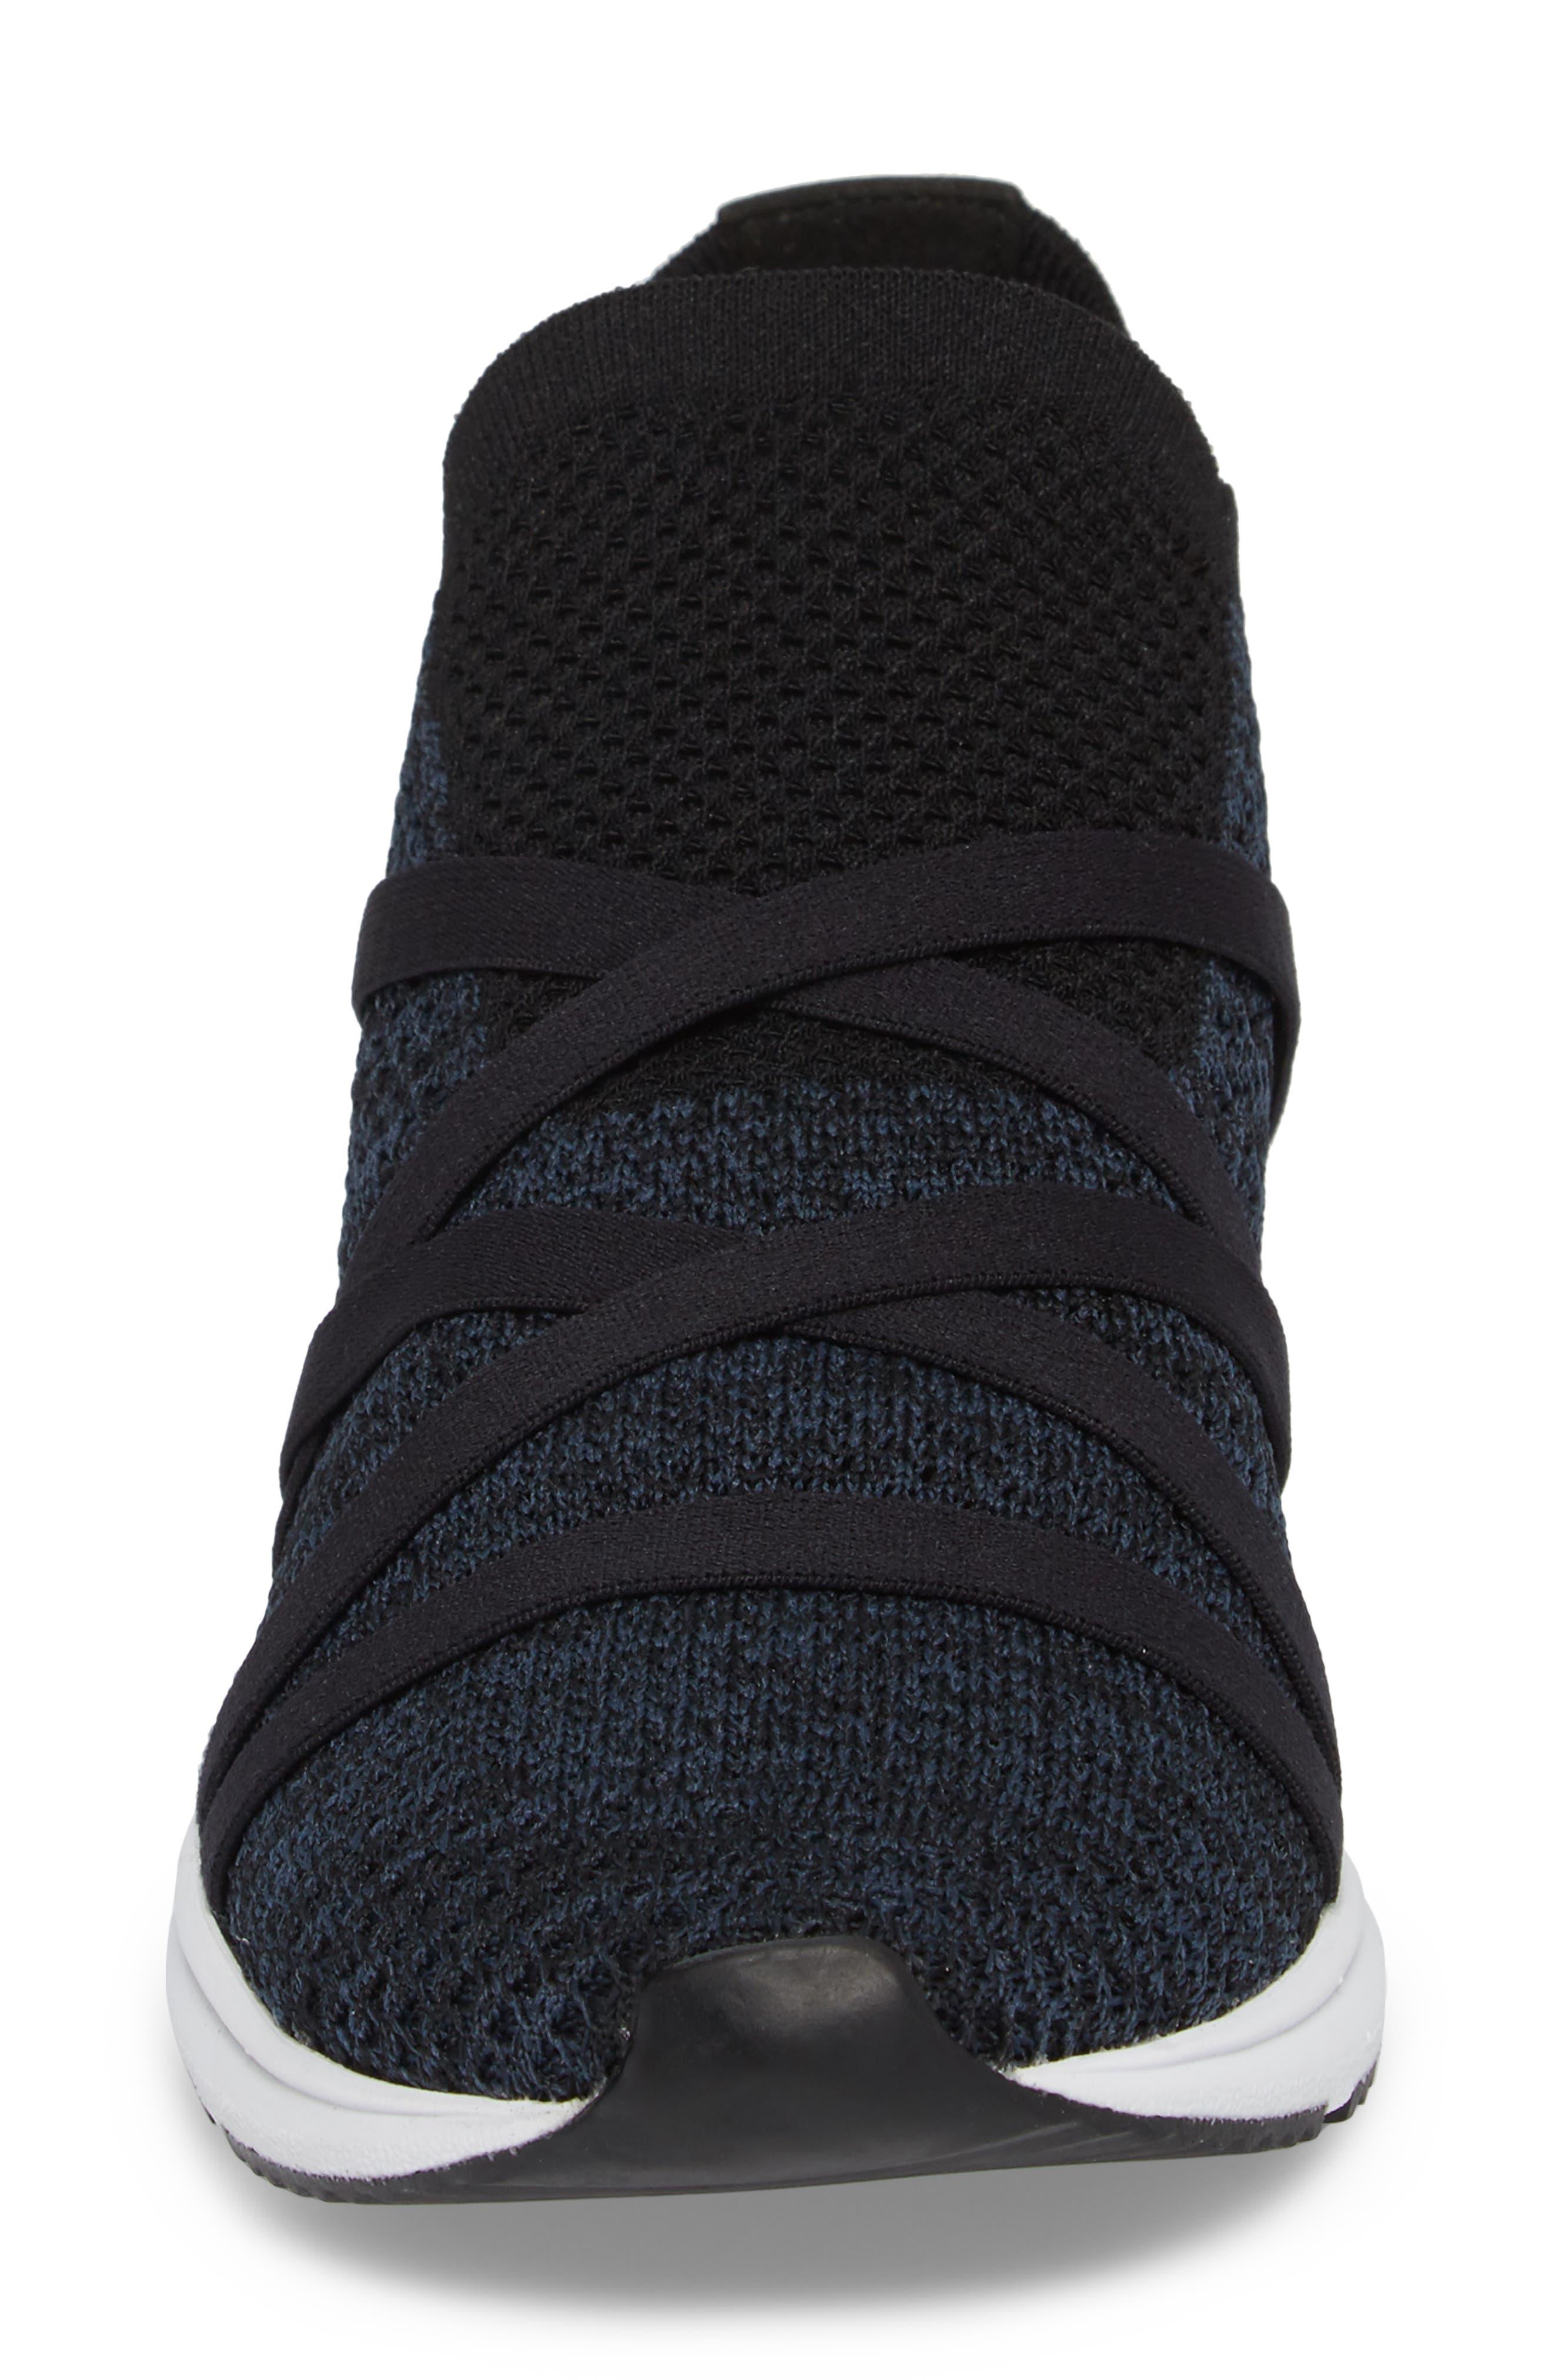 Xanady Woven Slip-On Sneaker,                             Alternate thumbnail 4, color,                             Black/ Marine Stretch